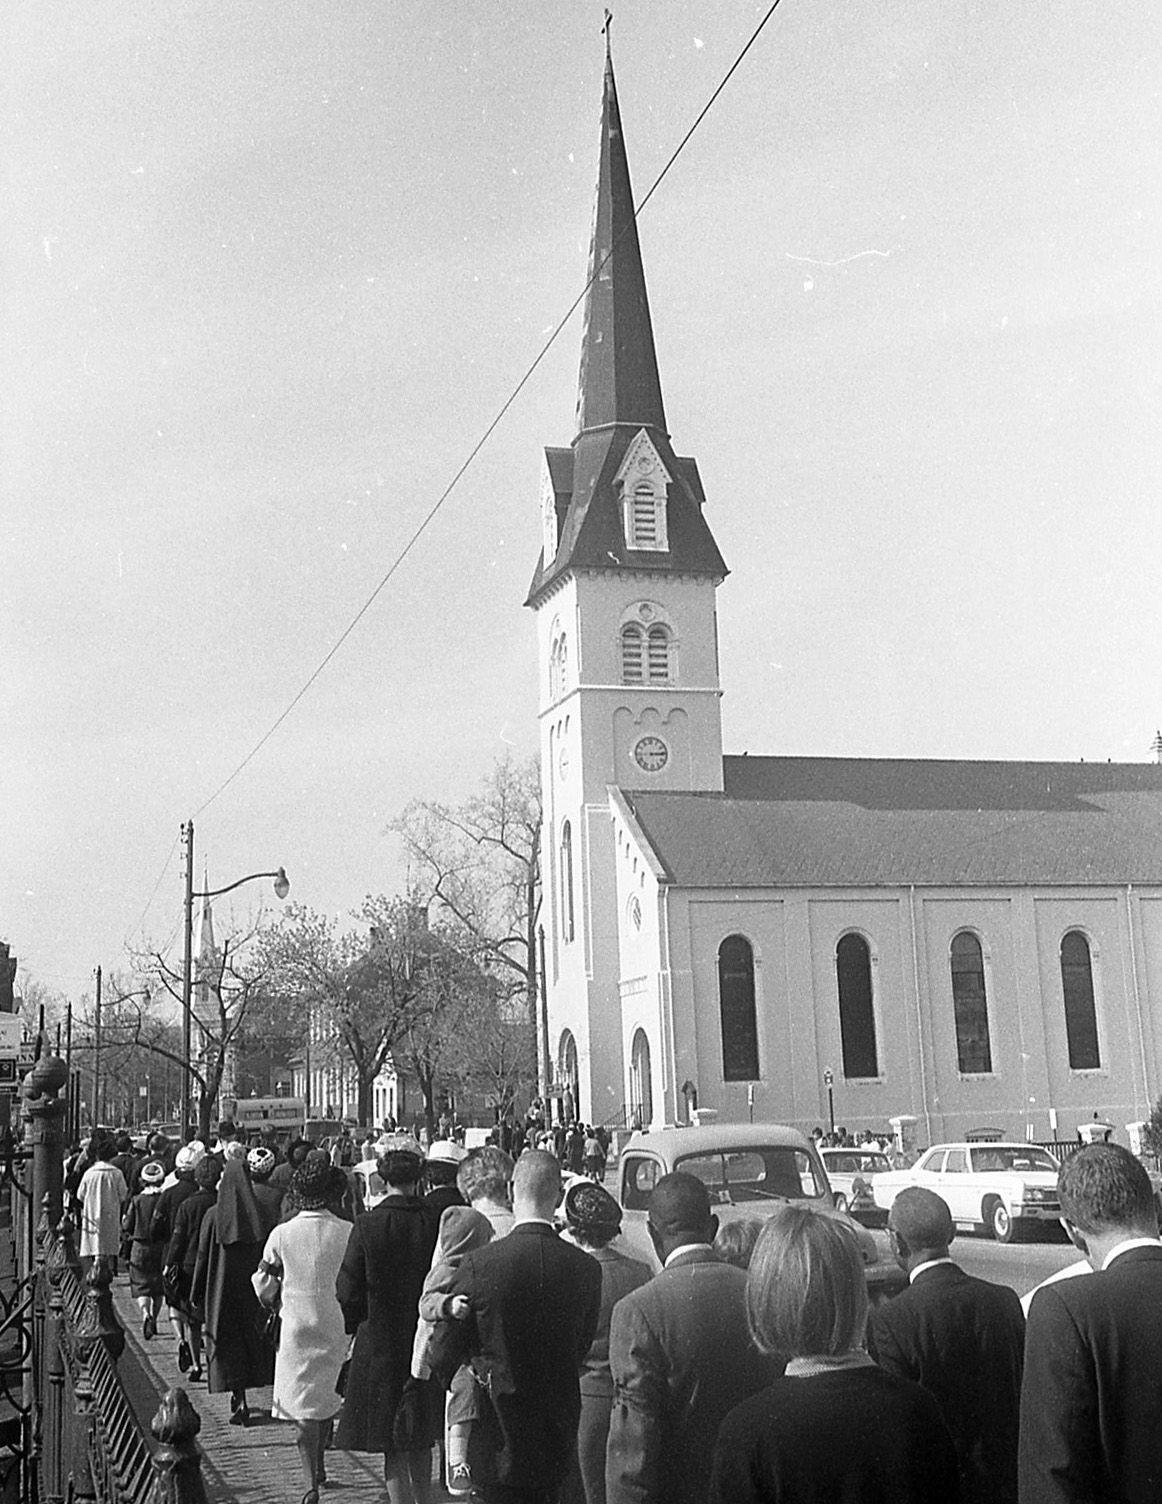 St. George Episcopal Church MLK procession